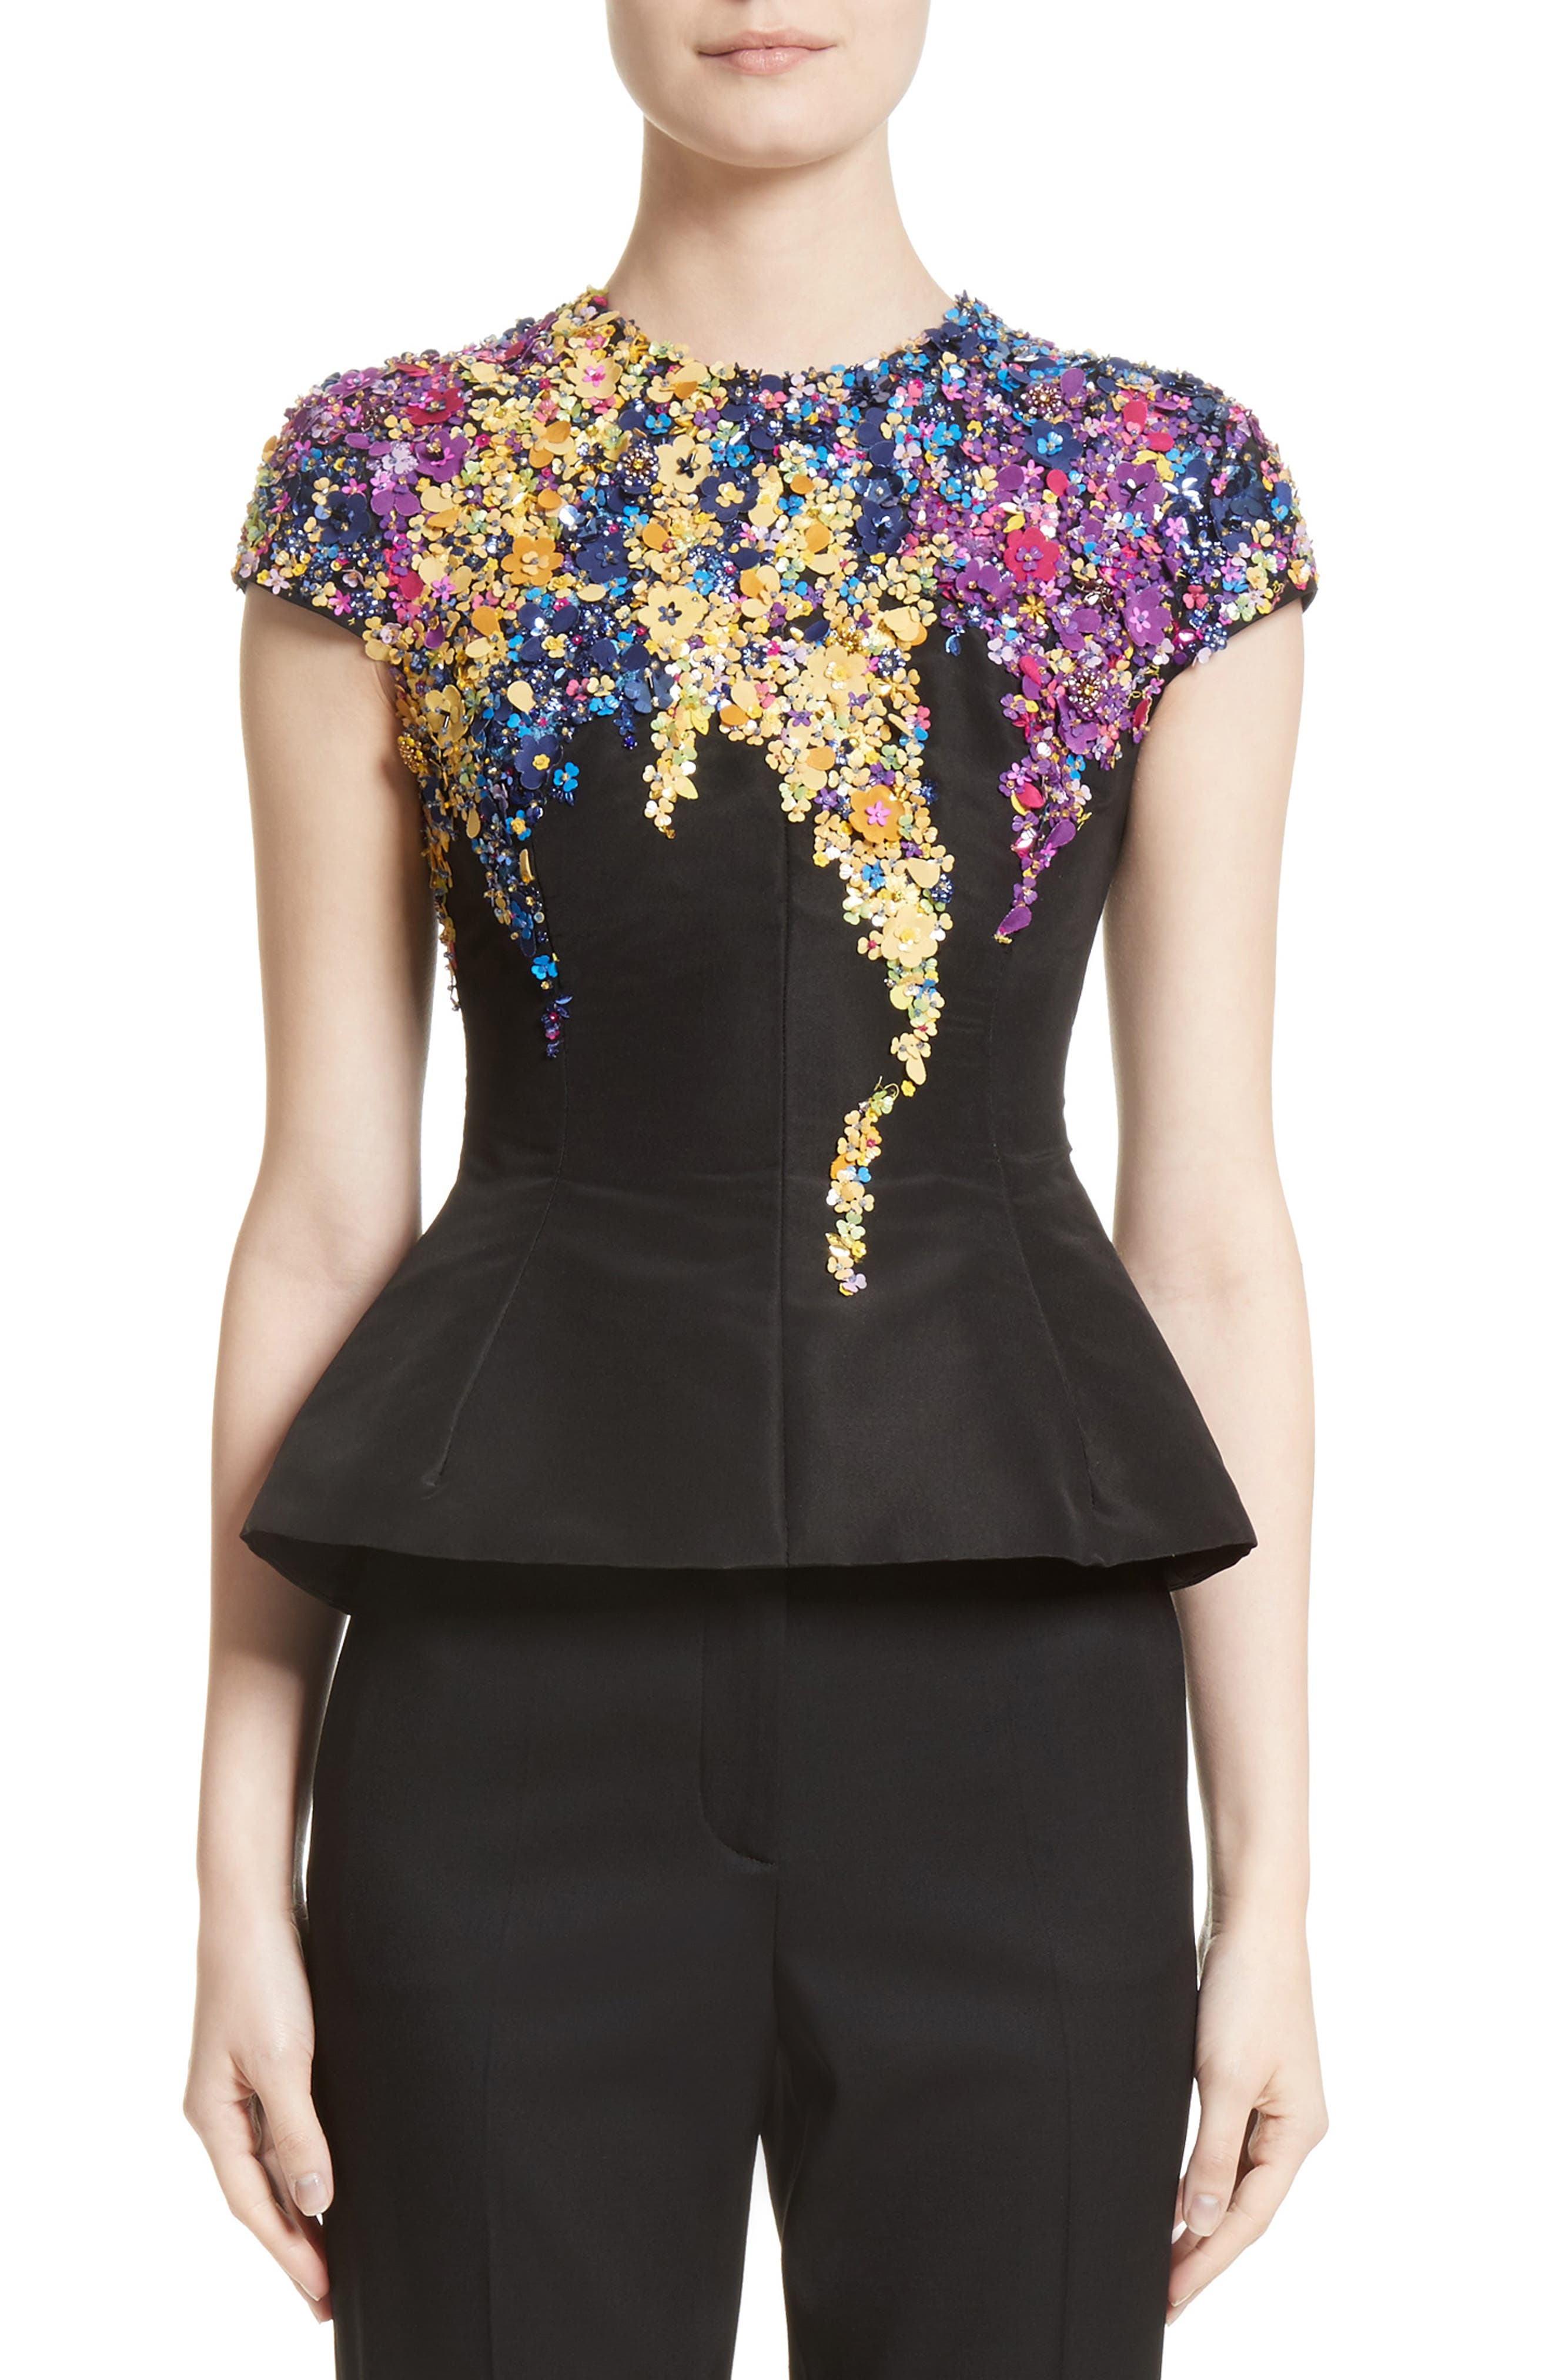 Oscar de la Renta Tendrils Floral Embroidered Silk Faille Top